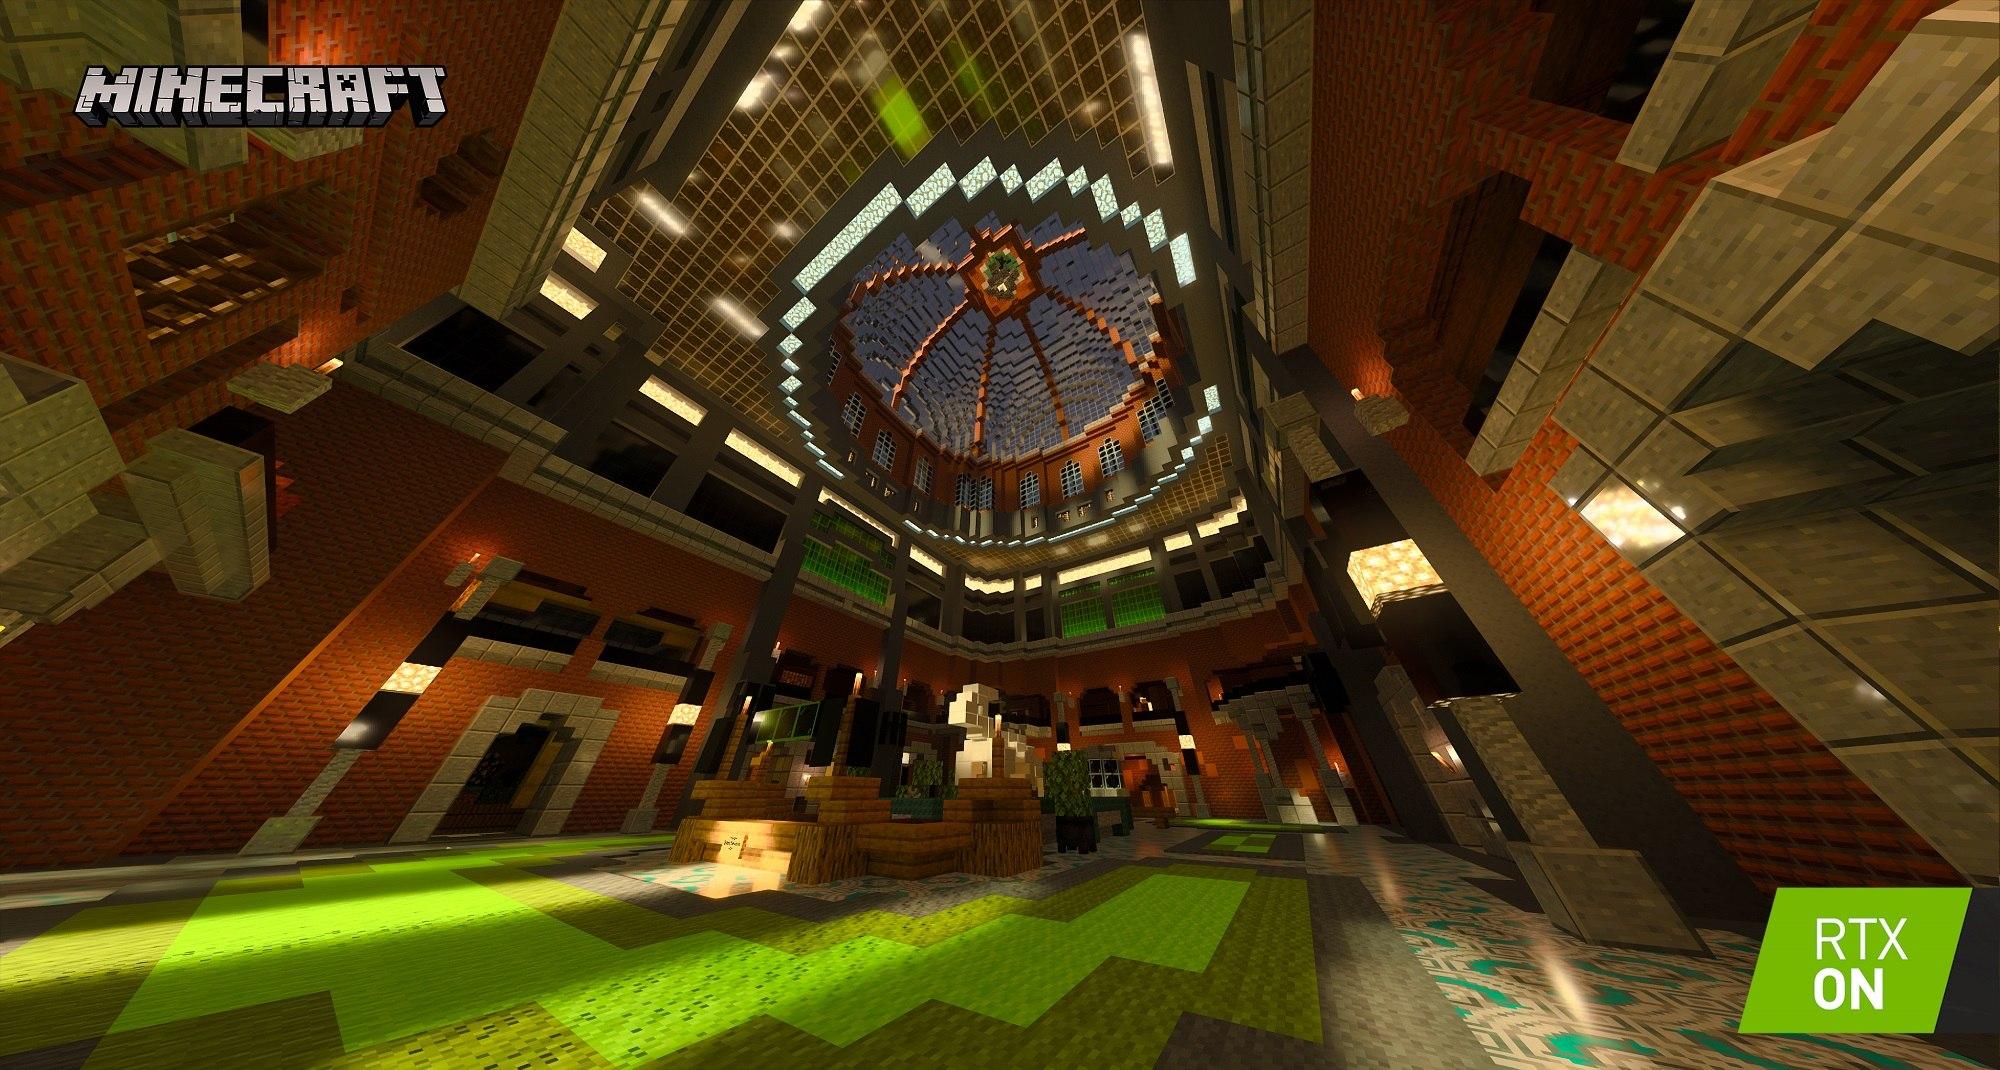 minecraft with rtx beta razzleberries texture showcase 003 rtx on